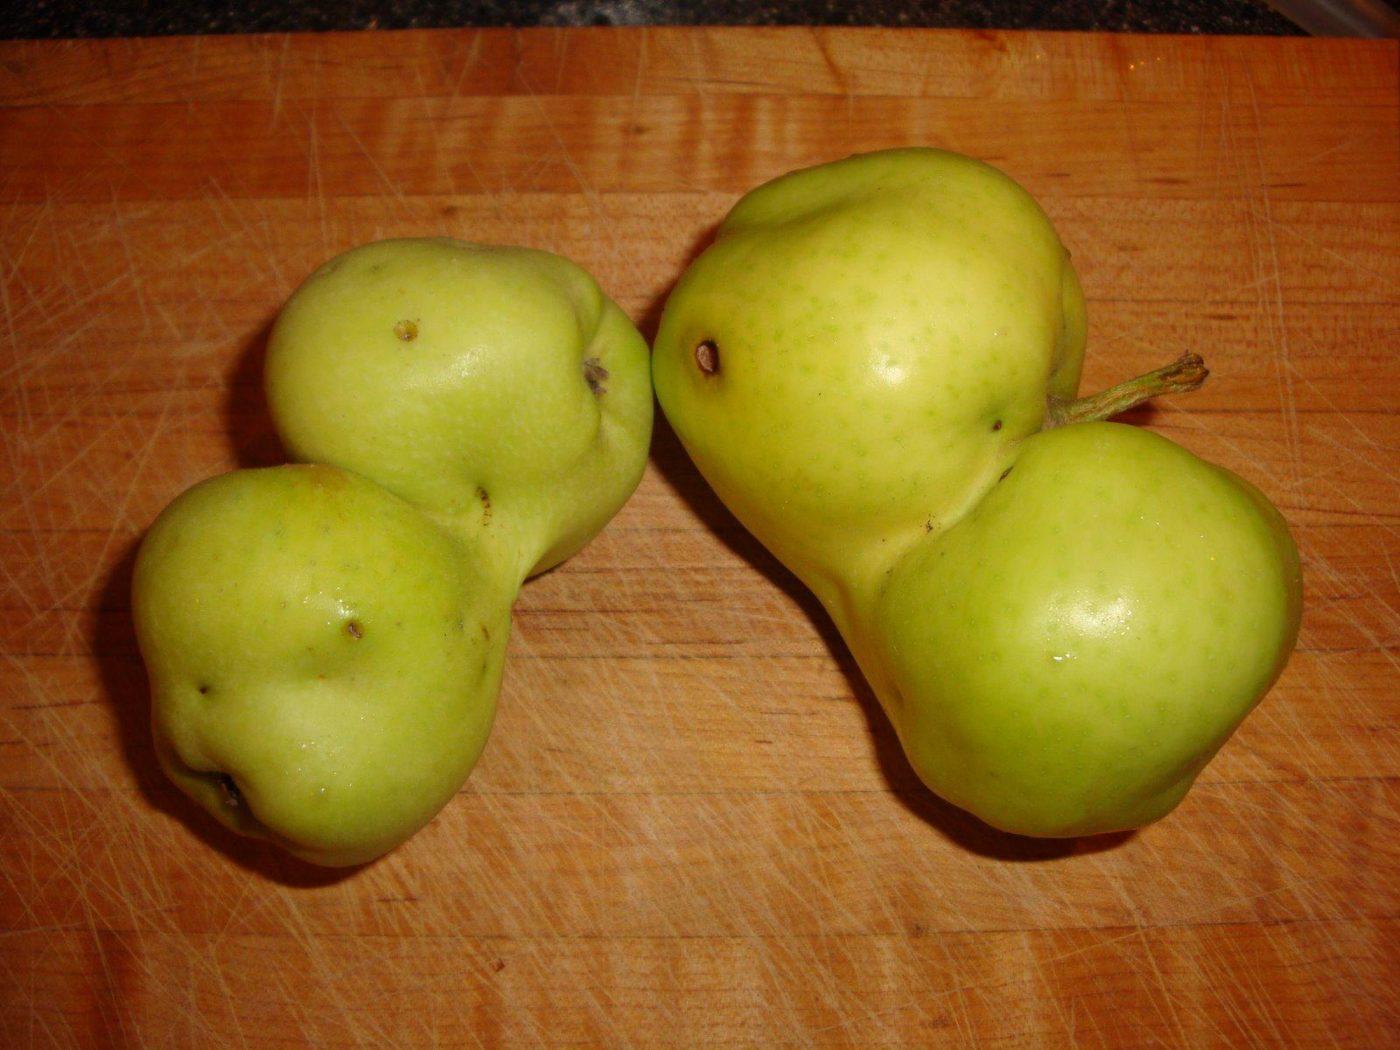 Apple harvest craziness